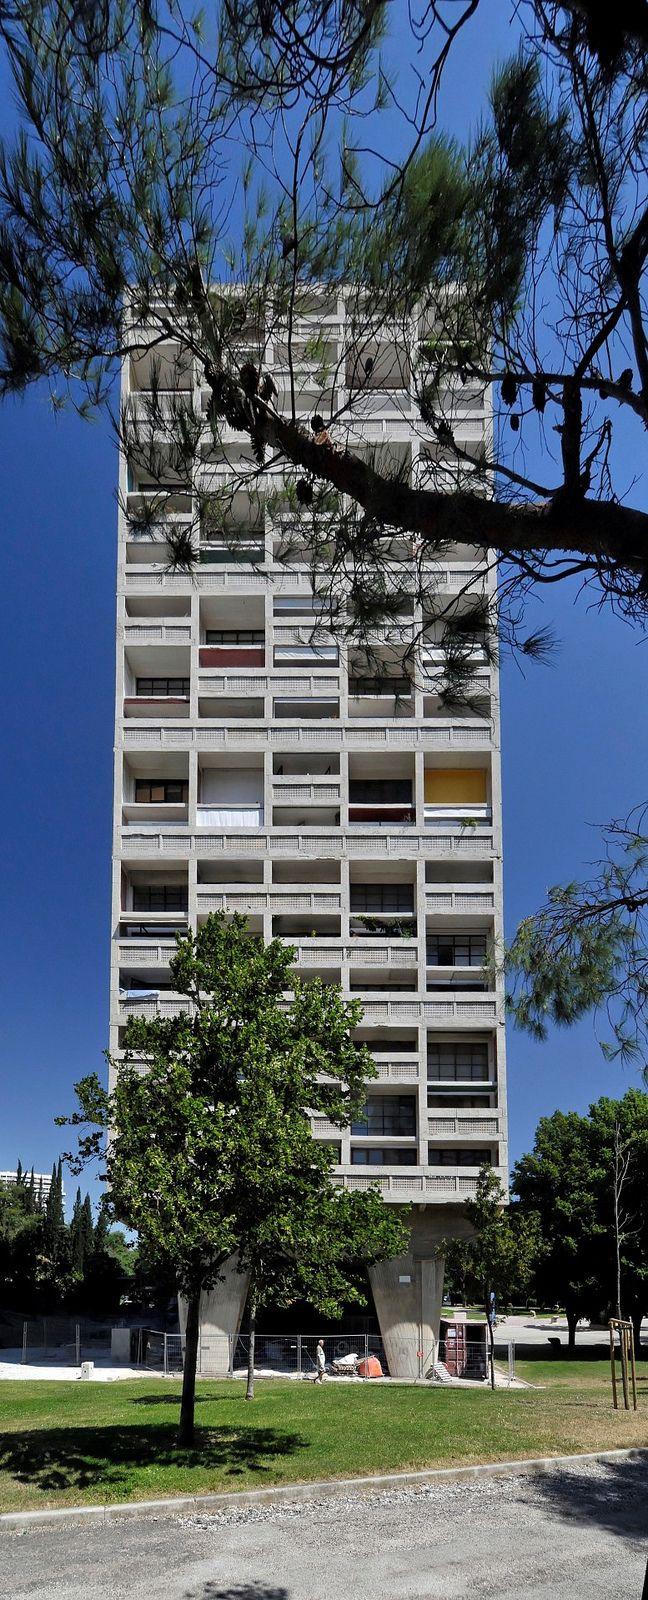 corbusierhaus unit d 39 habitation le corbusier berlin germany 1958 le corbusier. Black Bedroom Furniture Sets. Home Design Ideas